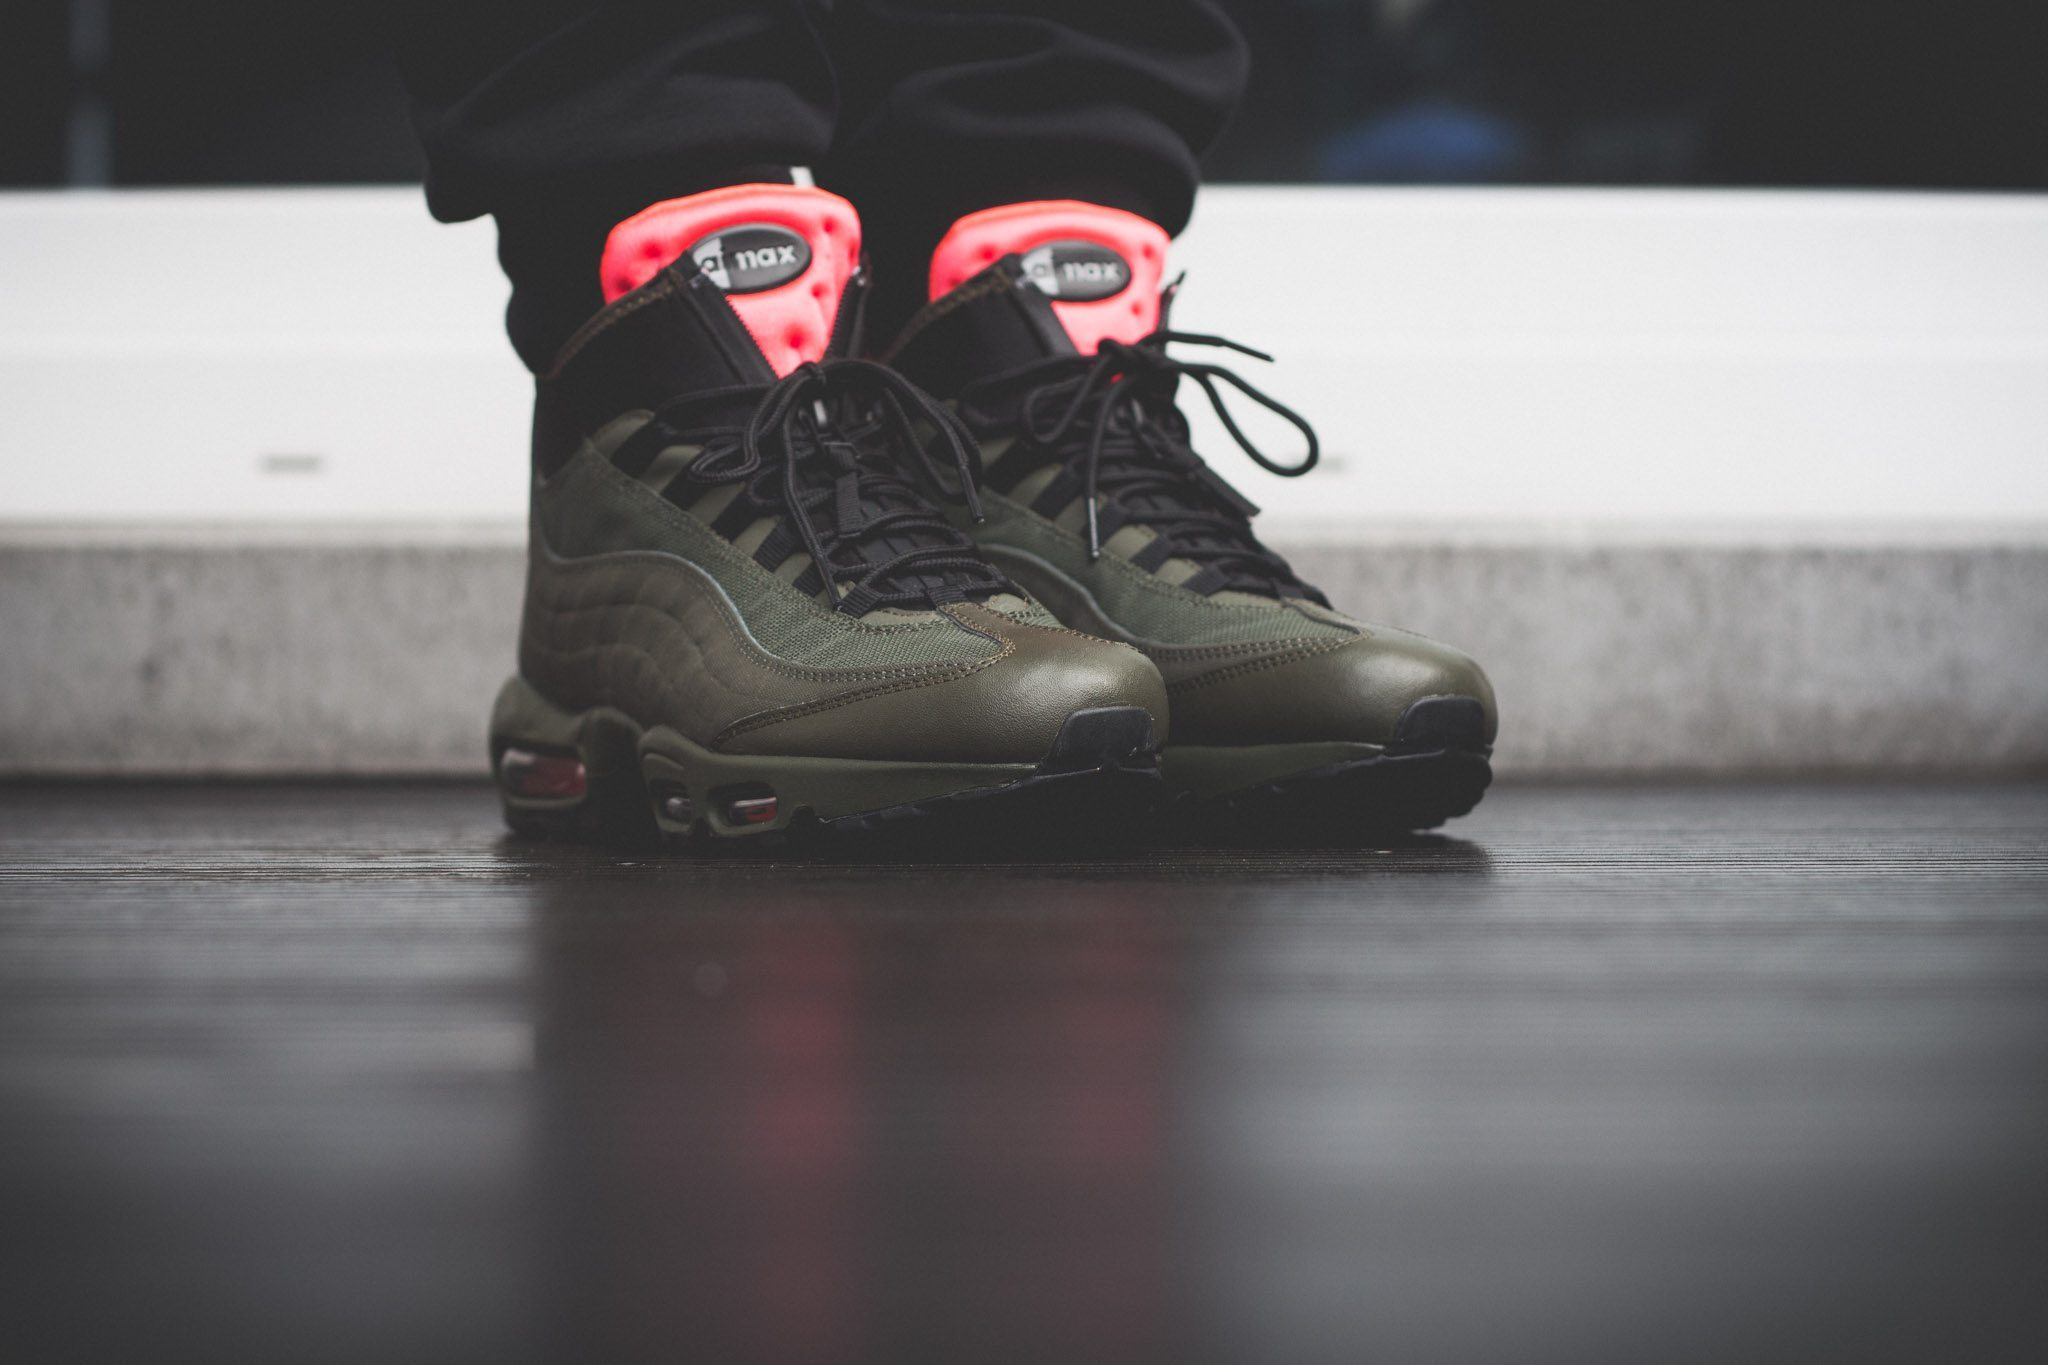 ᐅ Nike Air Max 95 SneakerBoot Review   #SNKR◁